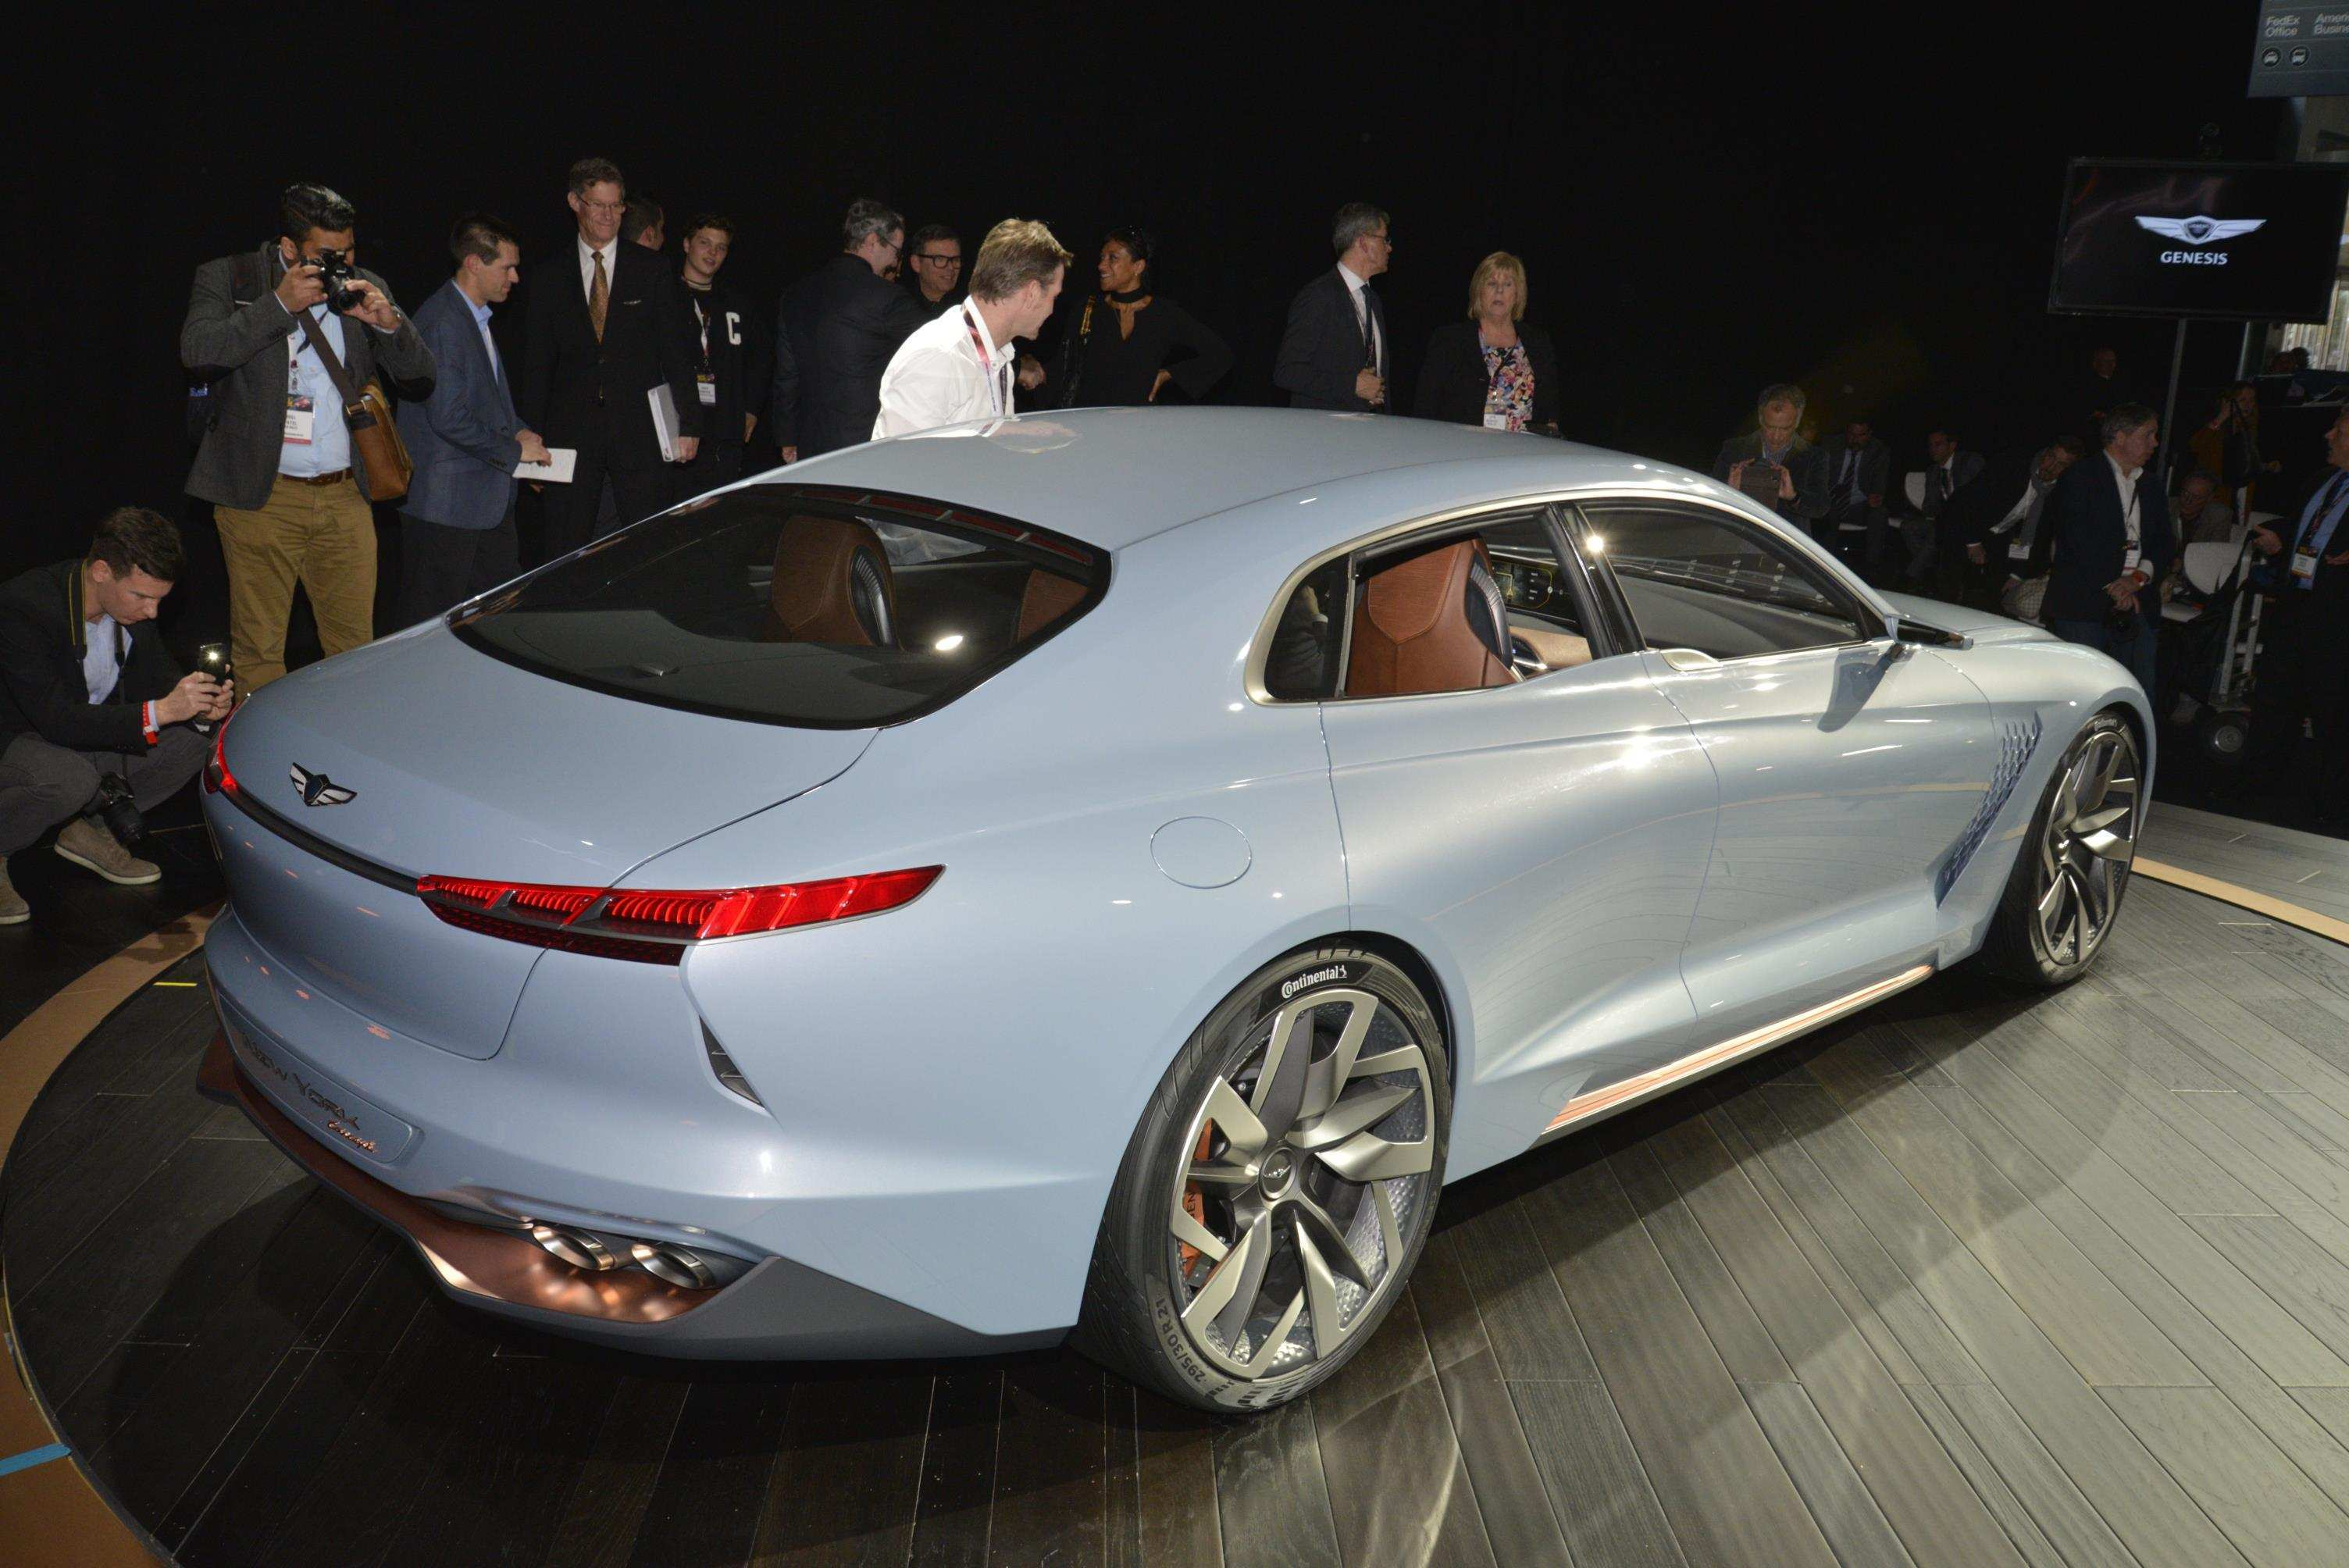 44 Best Review 2020 Hyundai Genesis Exterior and Interior by 2020 Hyundai Genesis